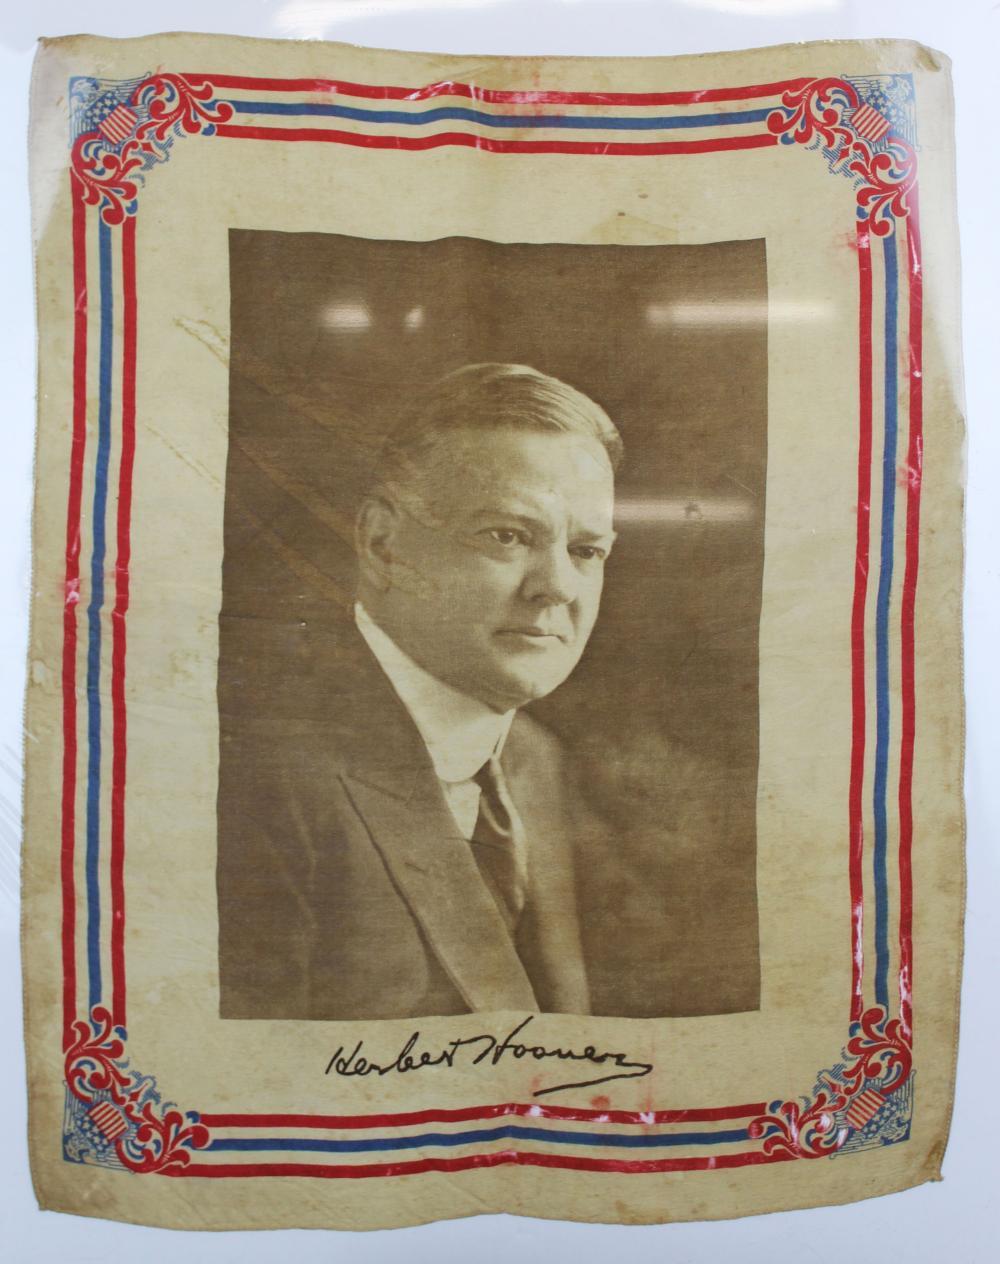 1928 Herbert Hoover printed cloth banner